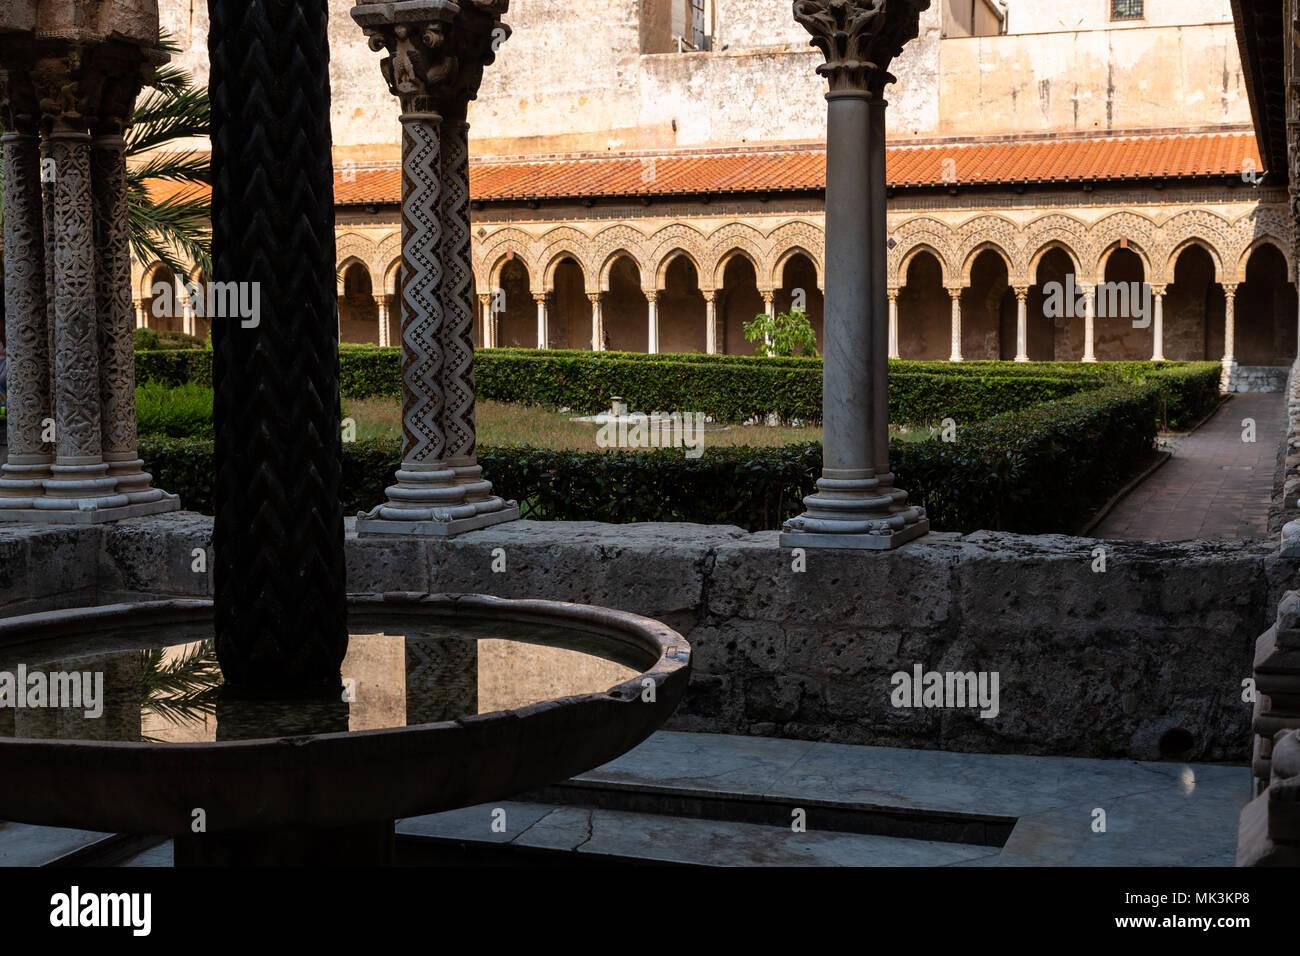 Claustro de Monreale, Sicilia, Italia Imagen De Stock